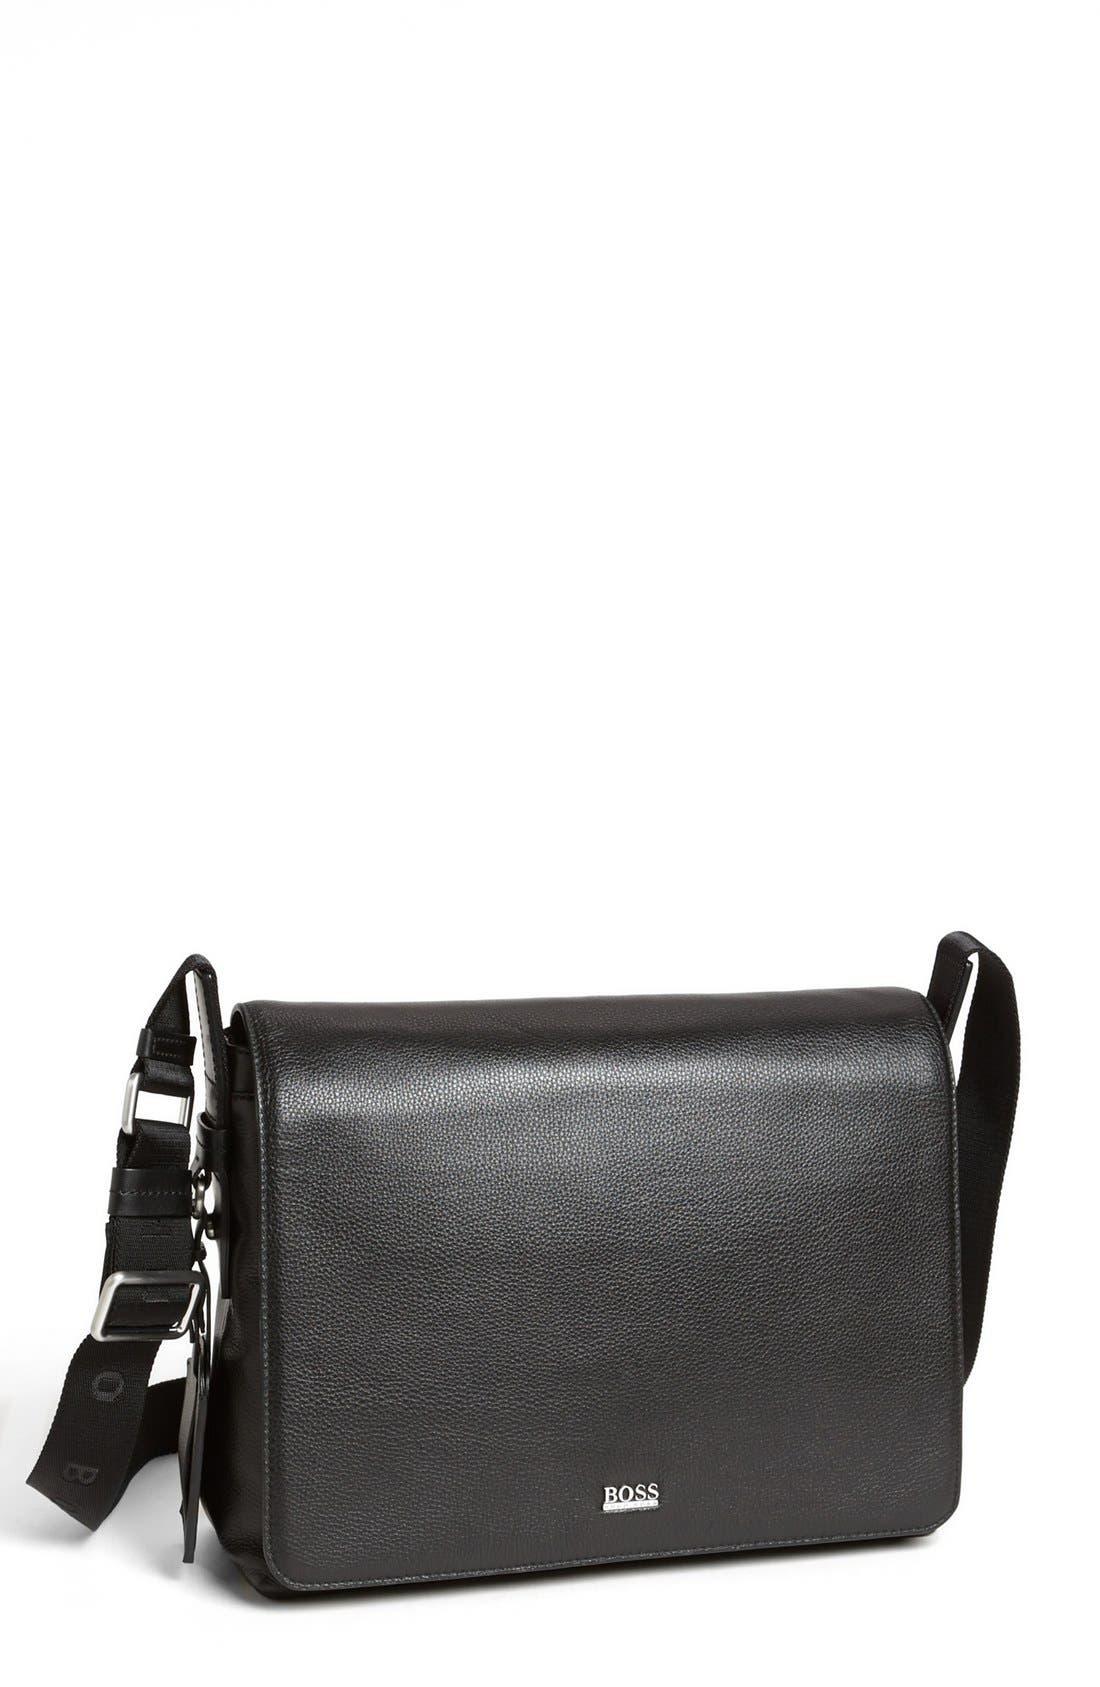 HUGO BOSS 'Barter' Leather Messenger Bag, Main, color, 001